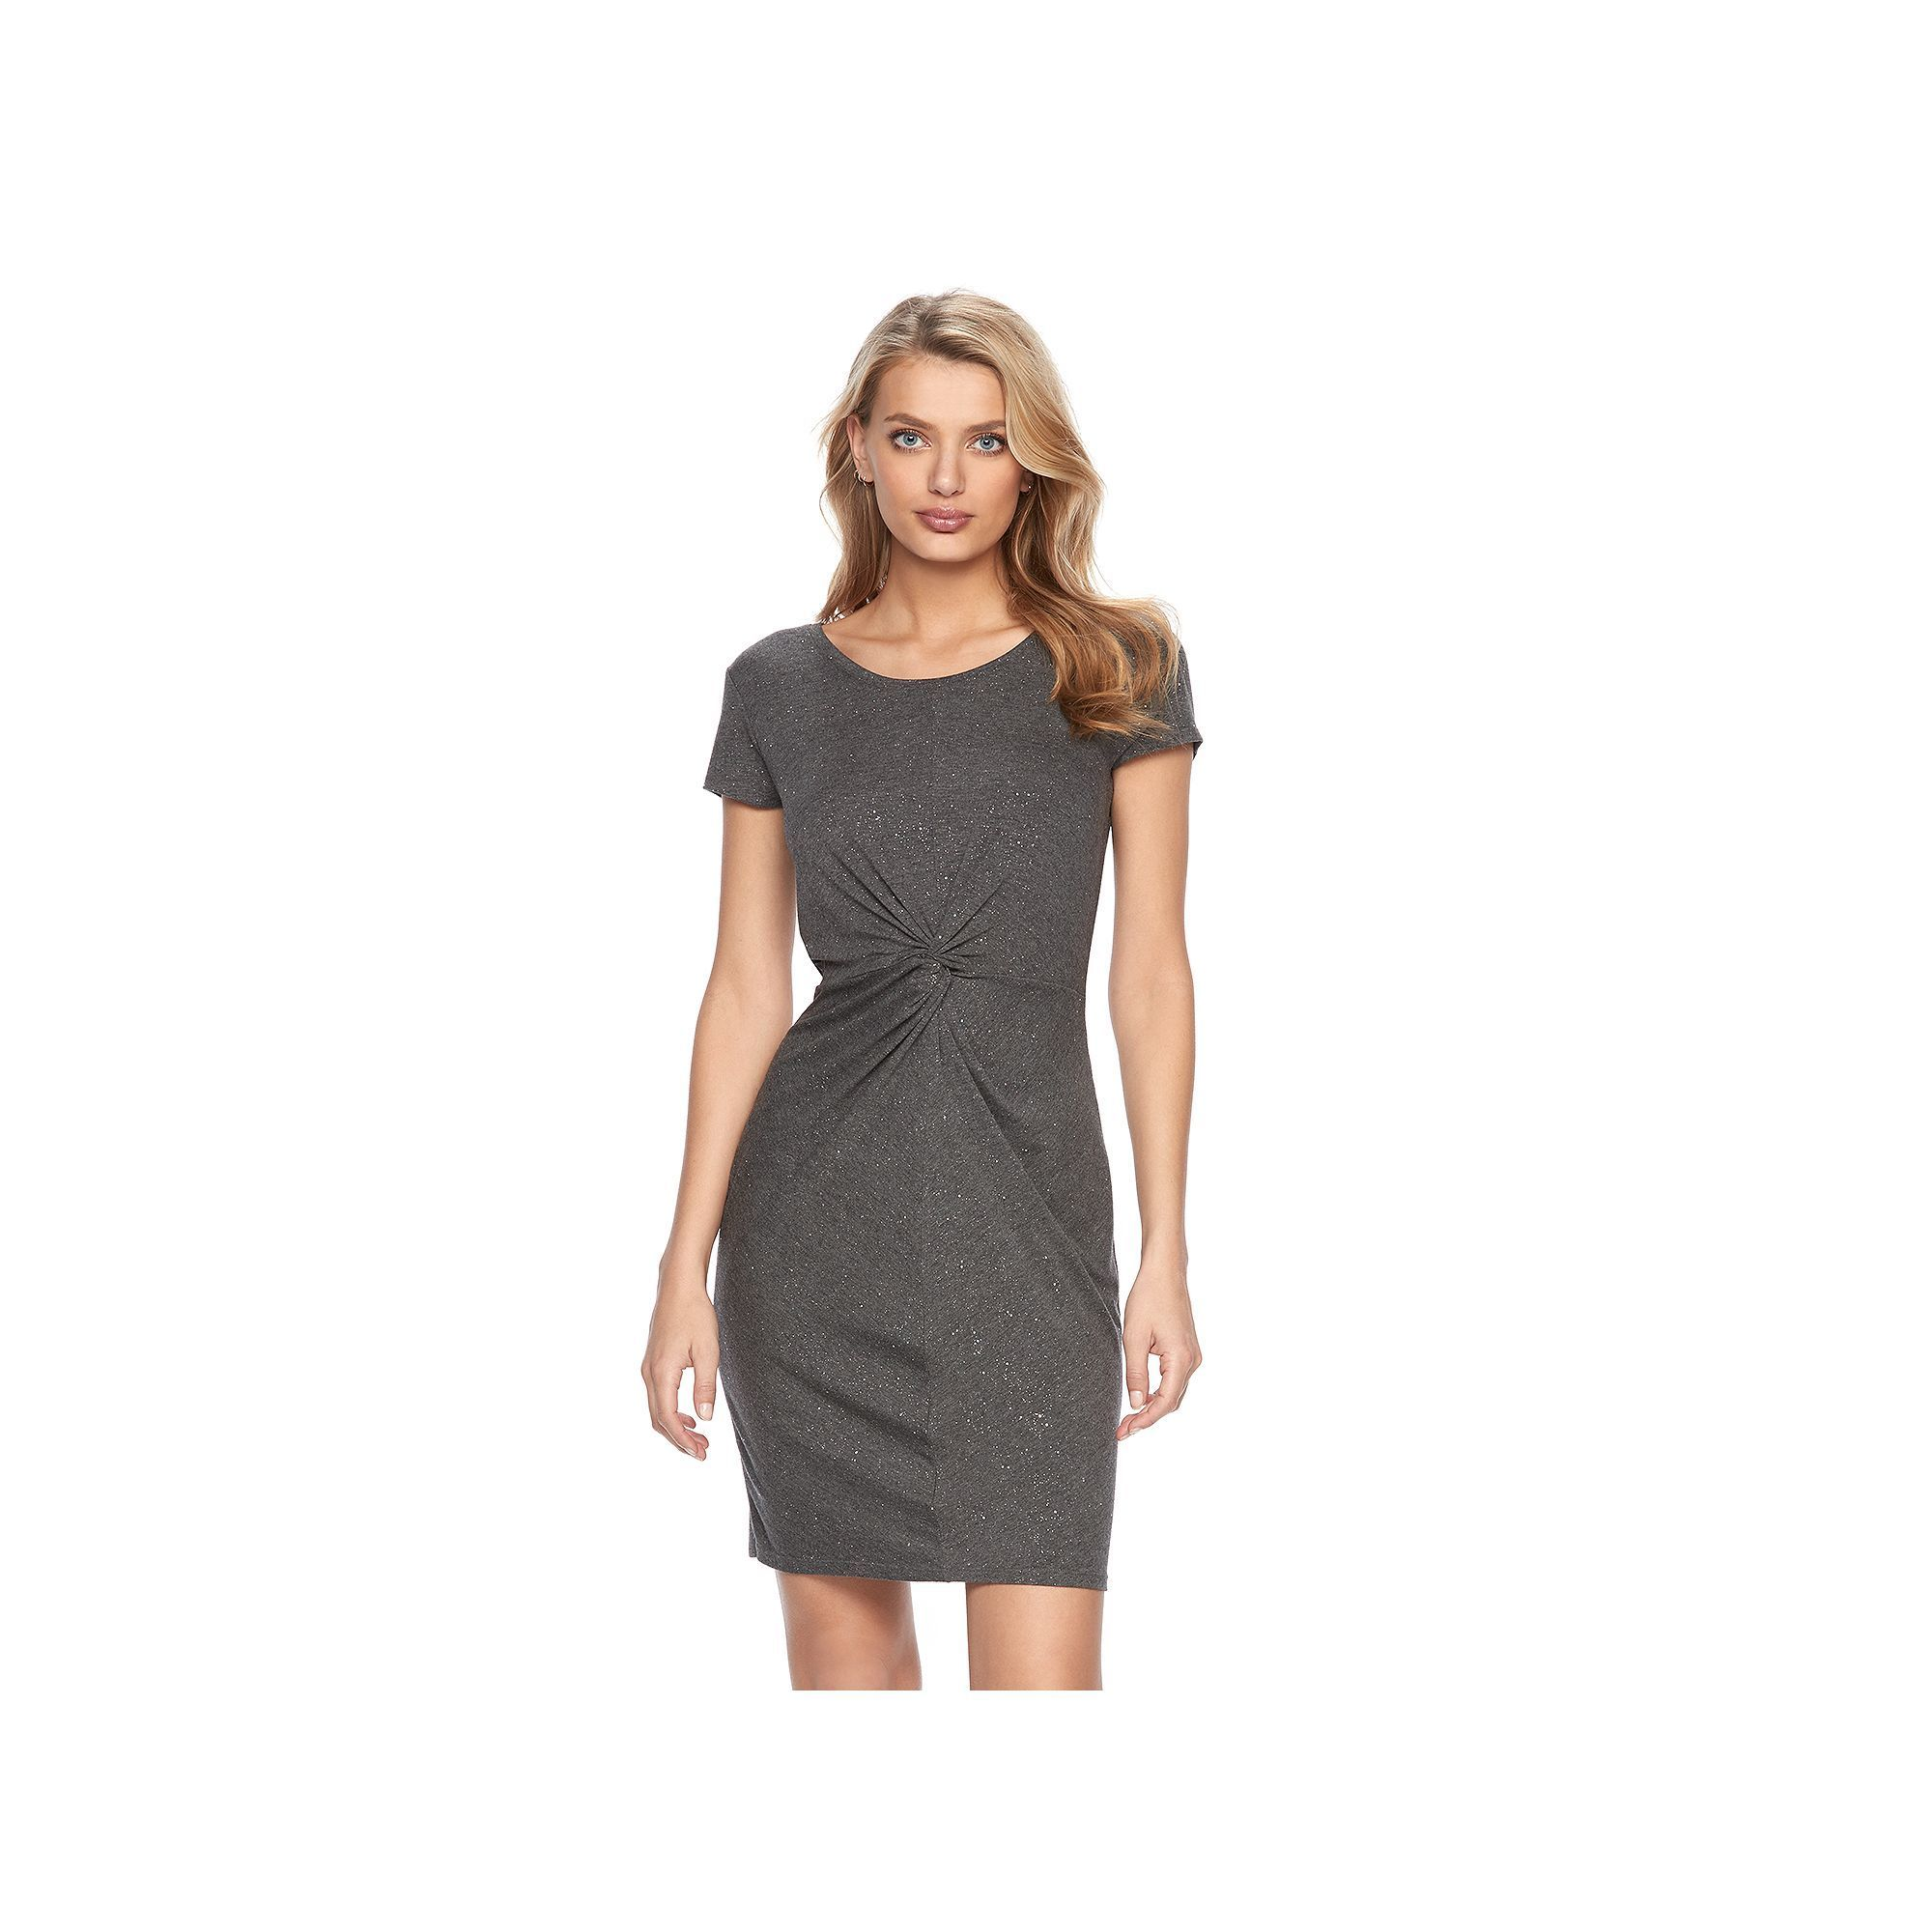 23d73e96aea4 Women s Juicy Couture Glitter Twist T-Shirt Dress